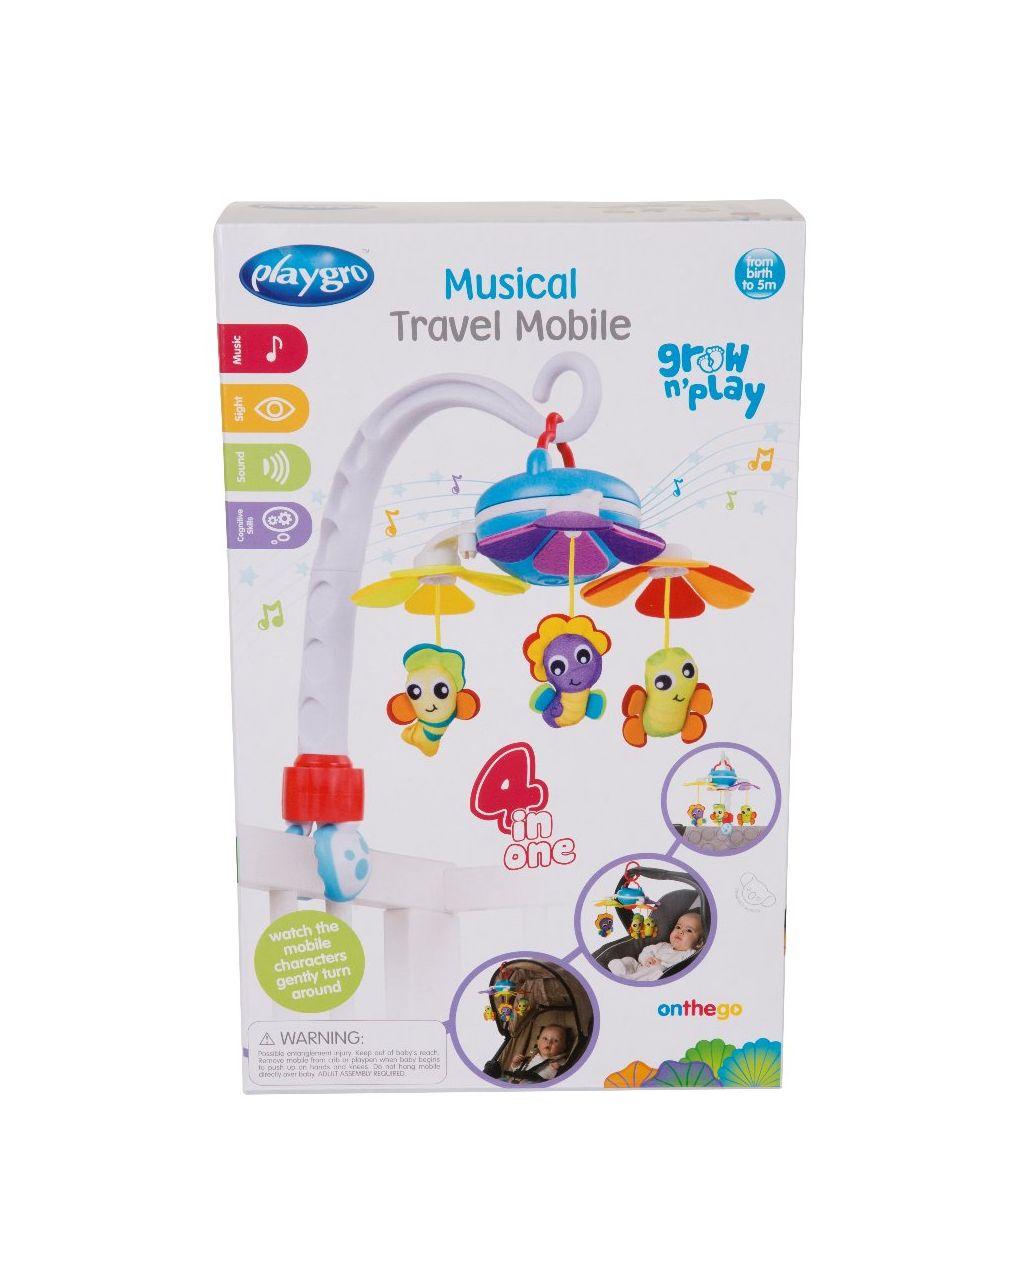 Playgro - musical travel mobile - Playgro